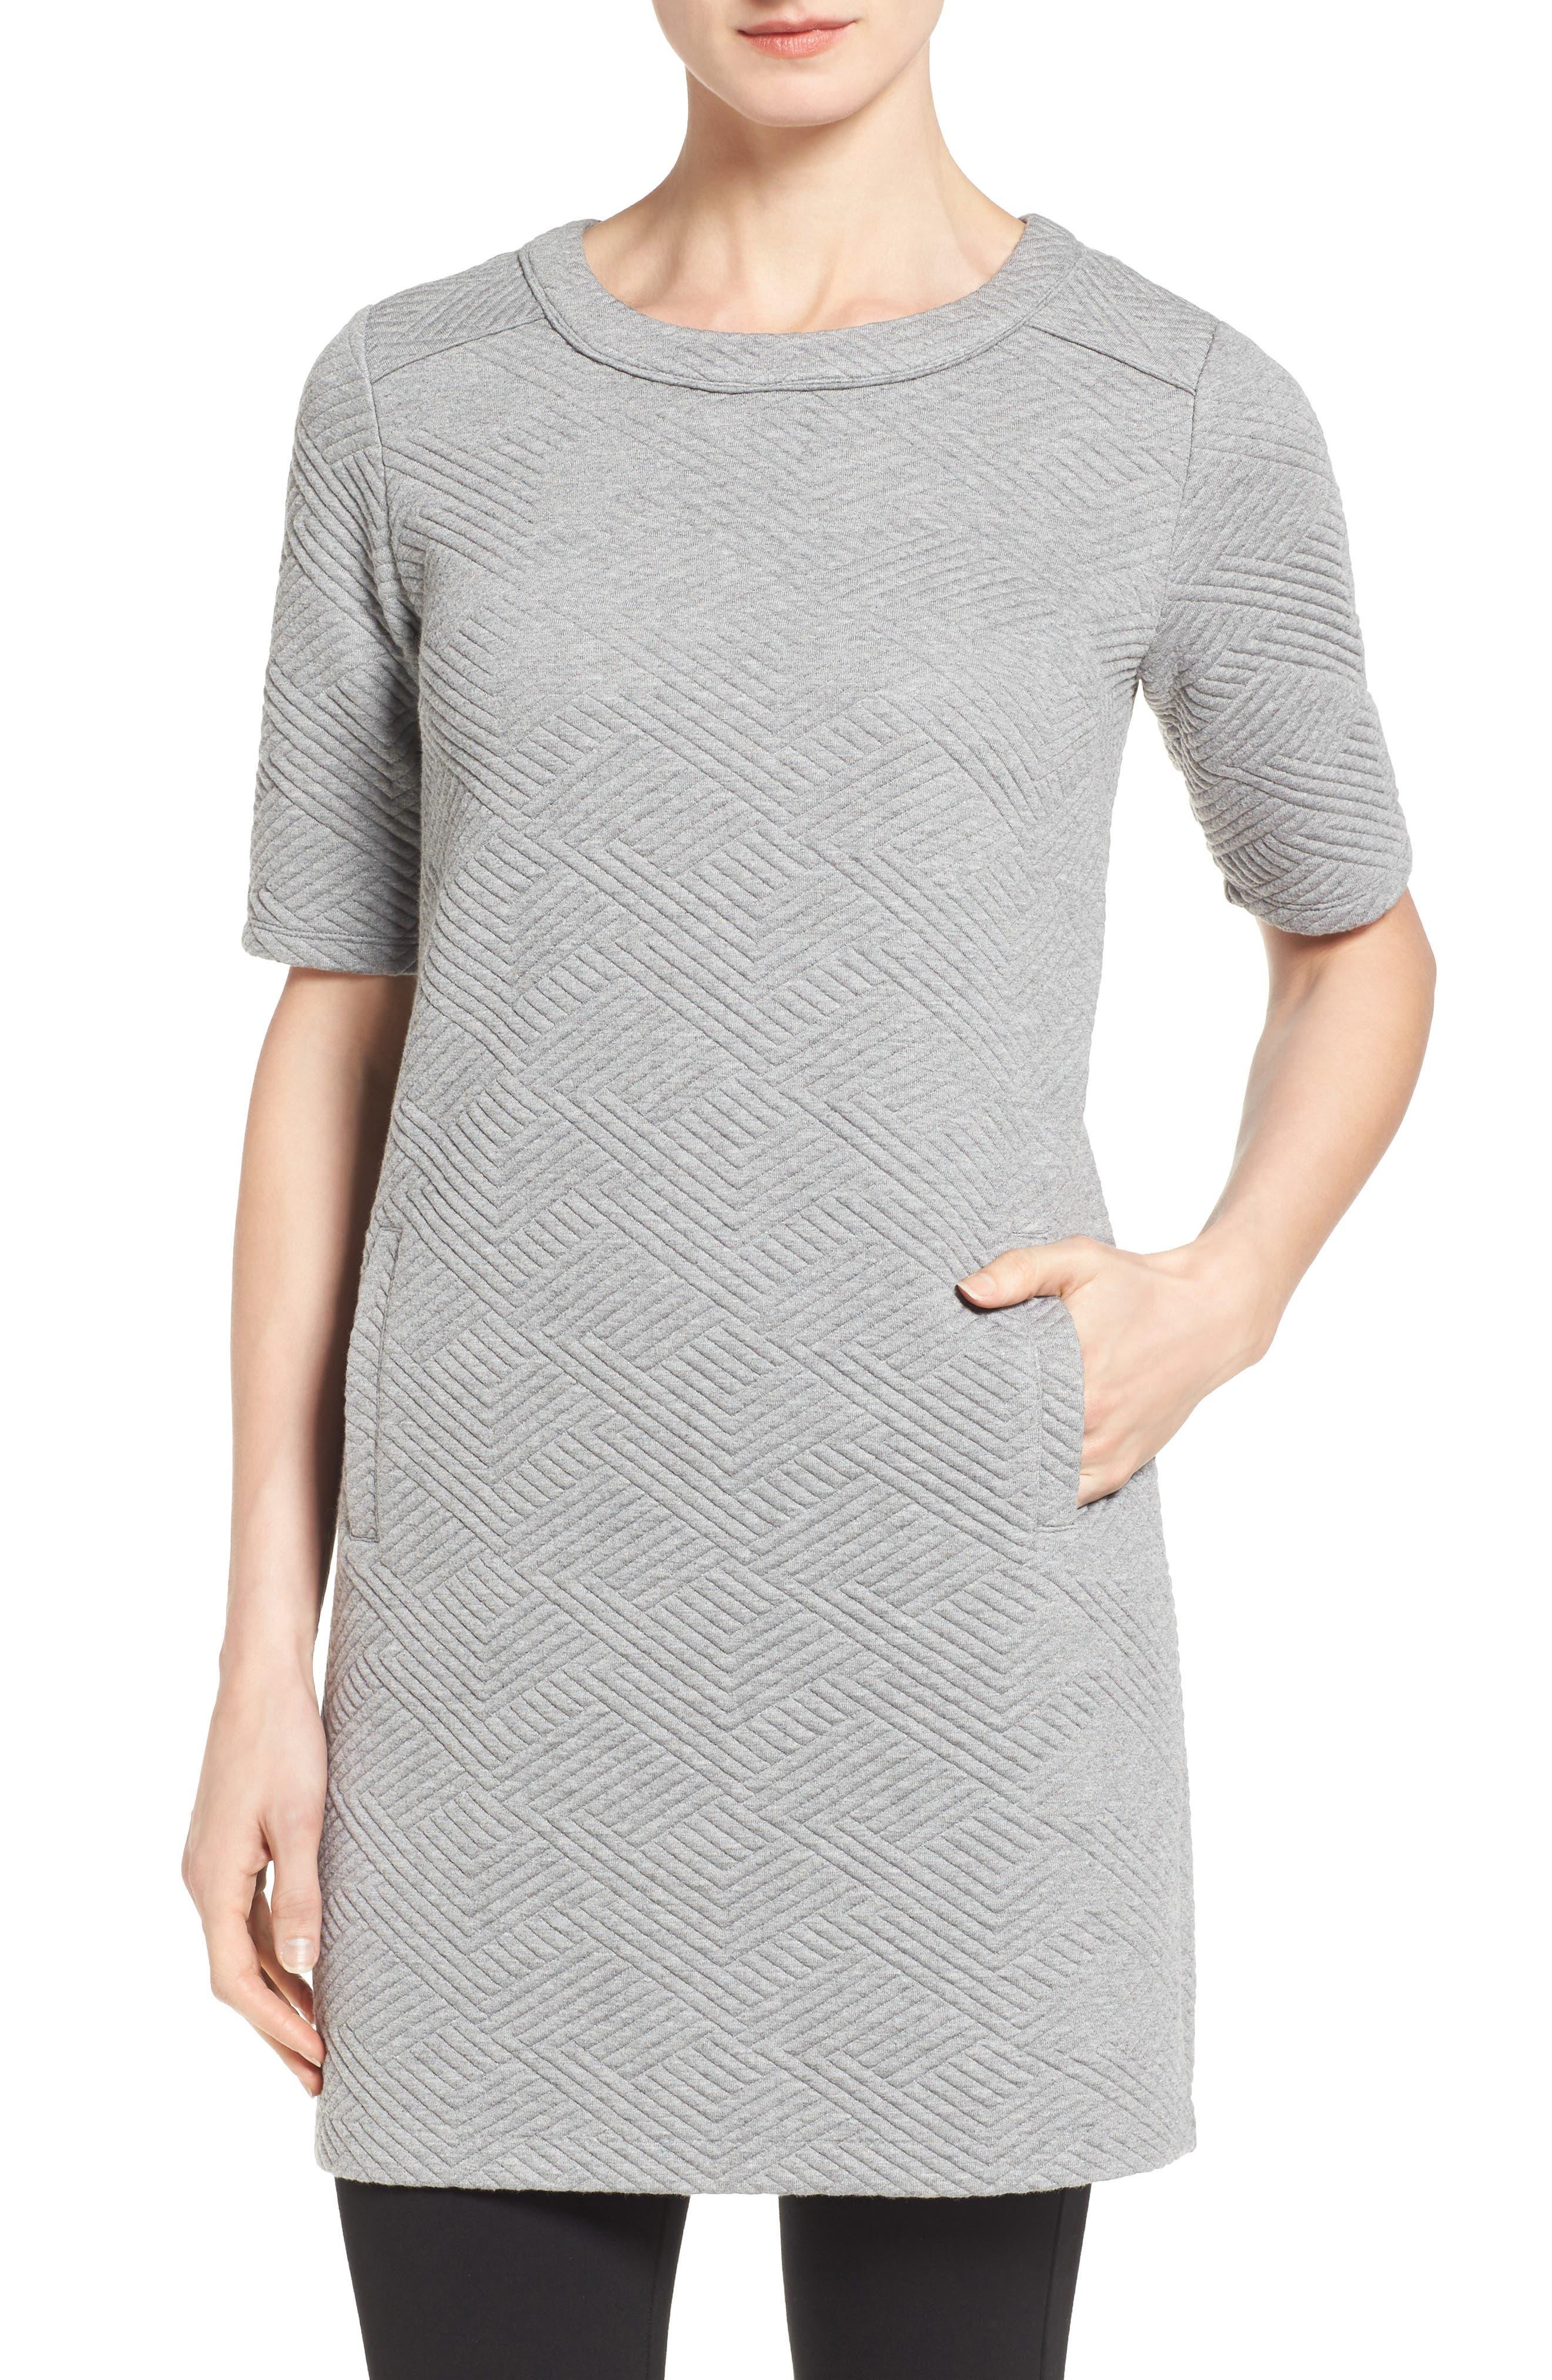 Textured Elbow Sleeve Tunic Dress,                             Main thumbnail 1, color,                             030